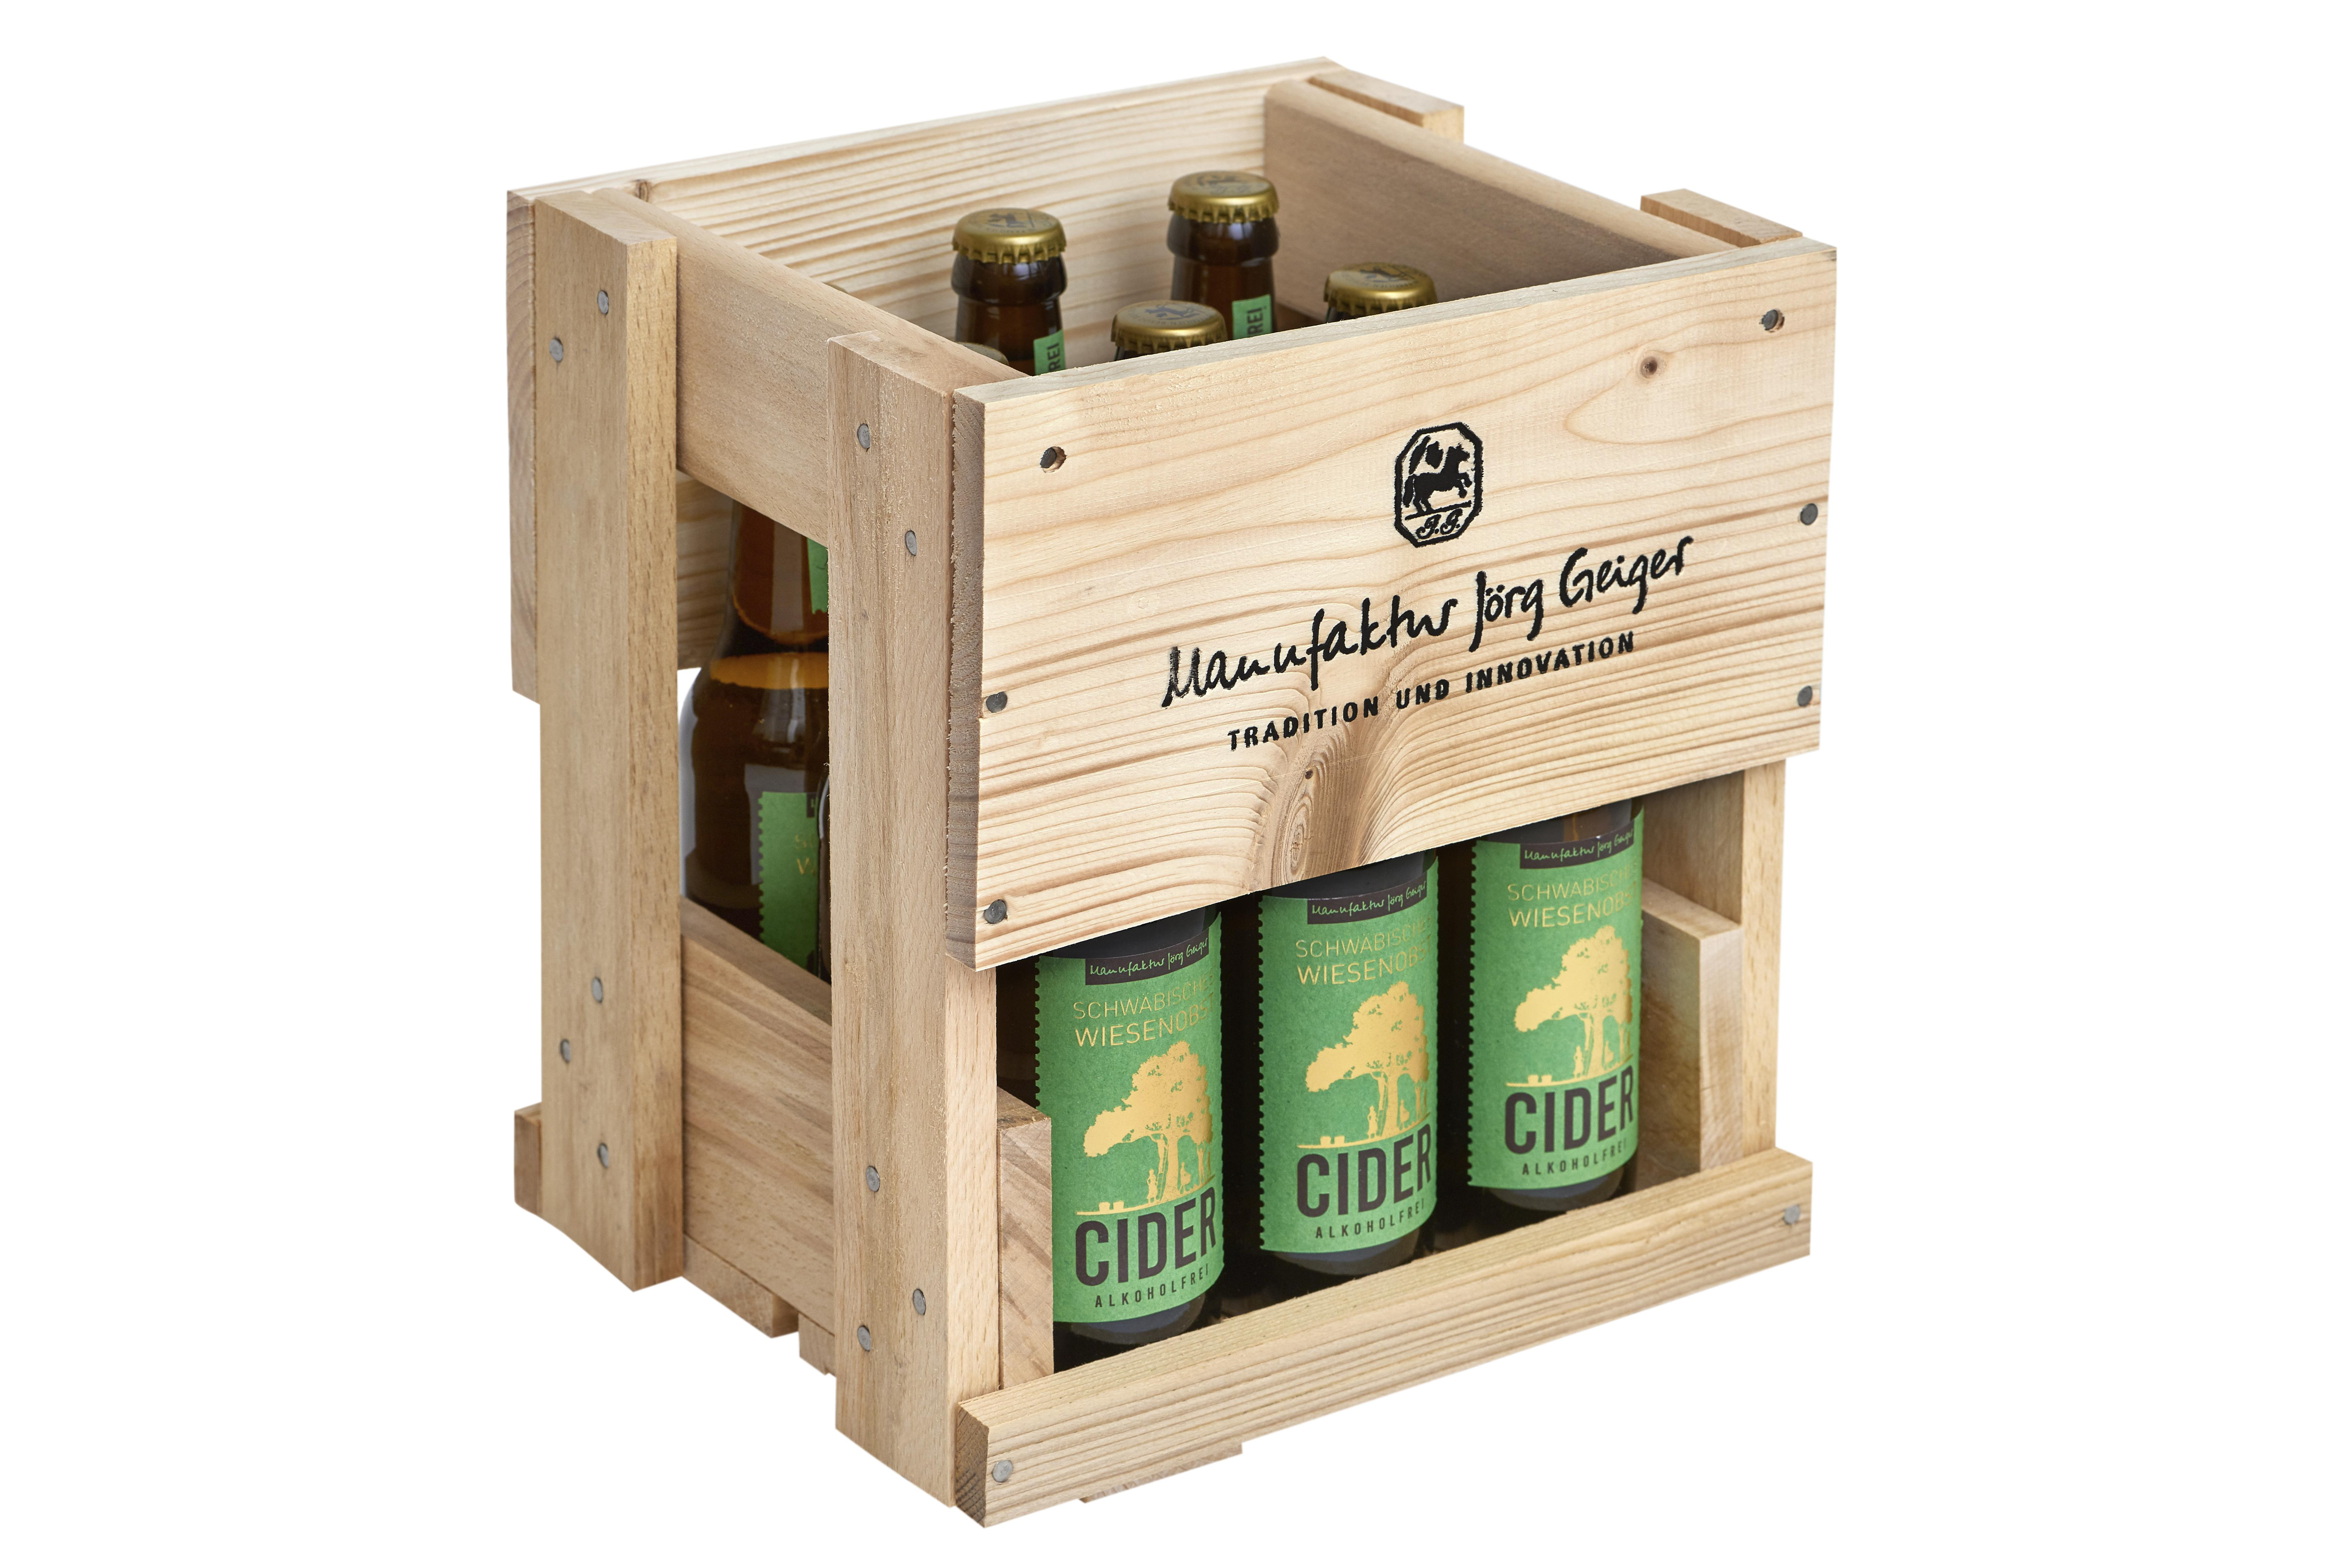 SWO Cider - alkoholfrei in der 9er Holzkiste